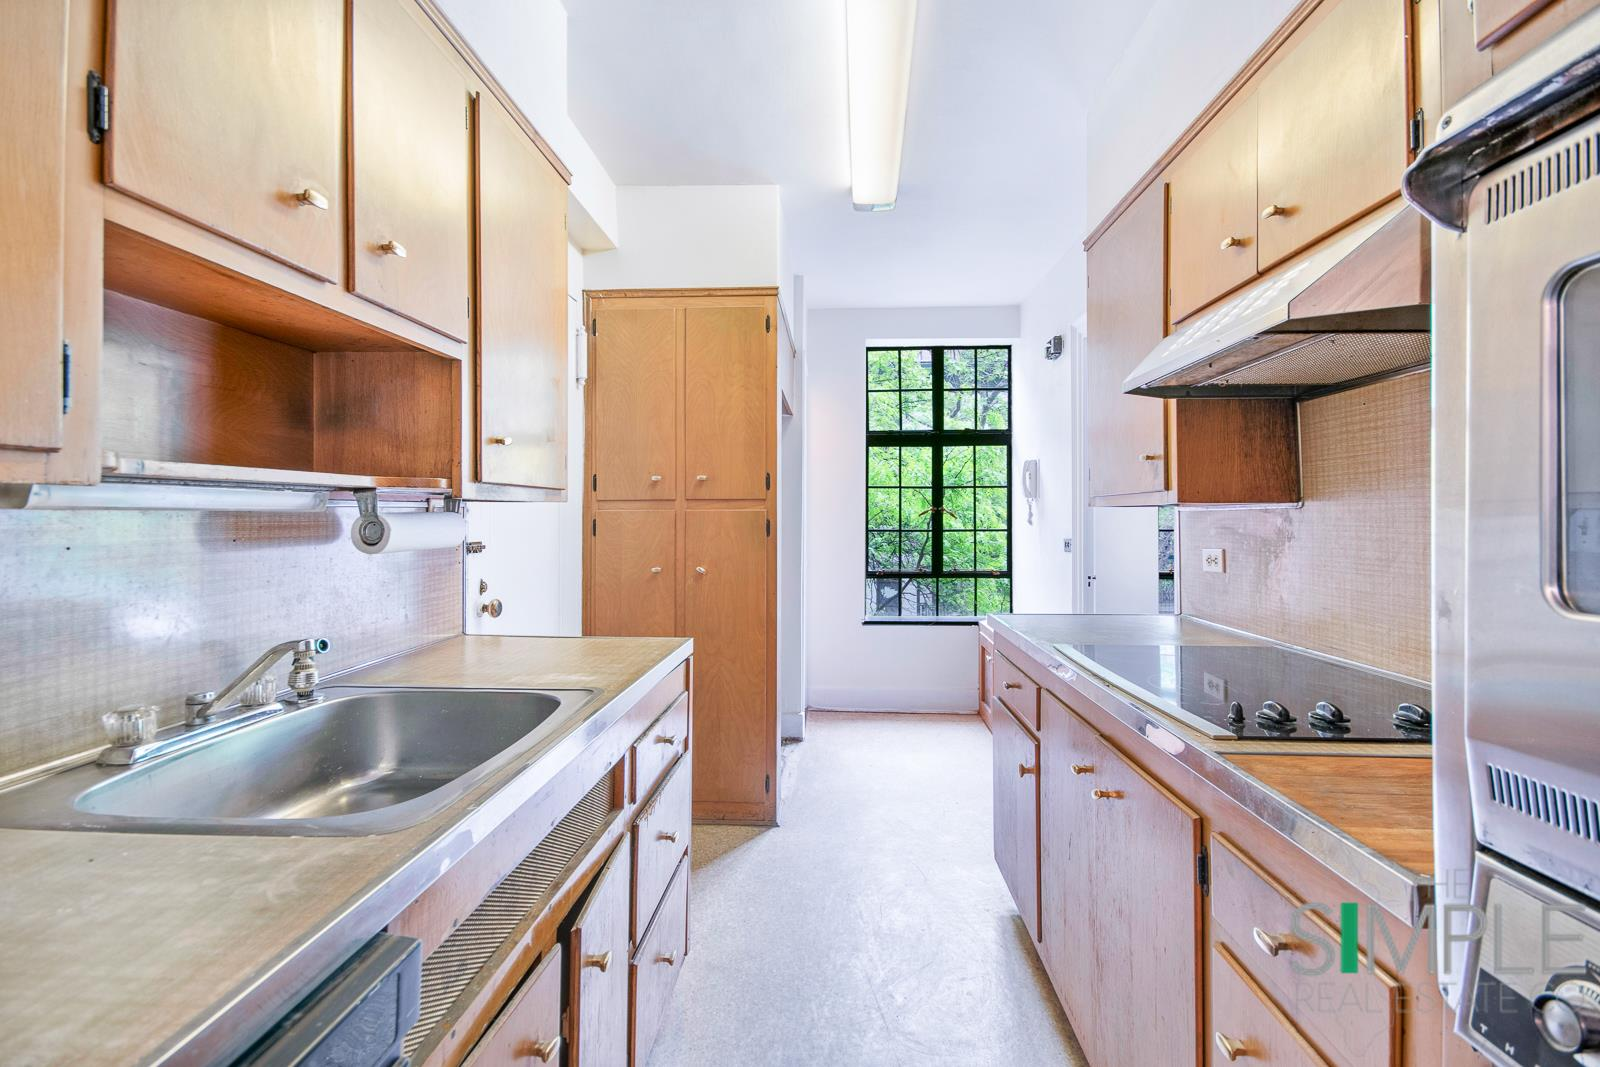 230 East 50th Street Turtle Bay New York NY 10022